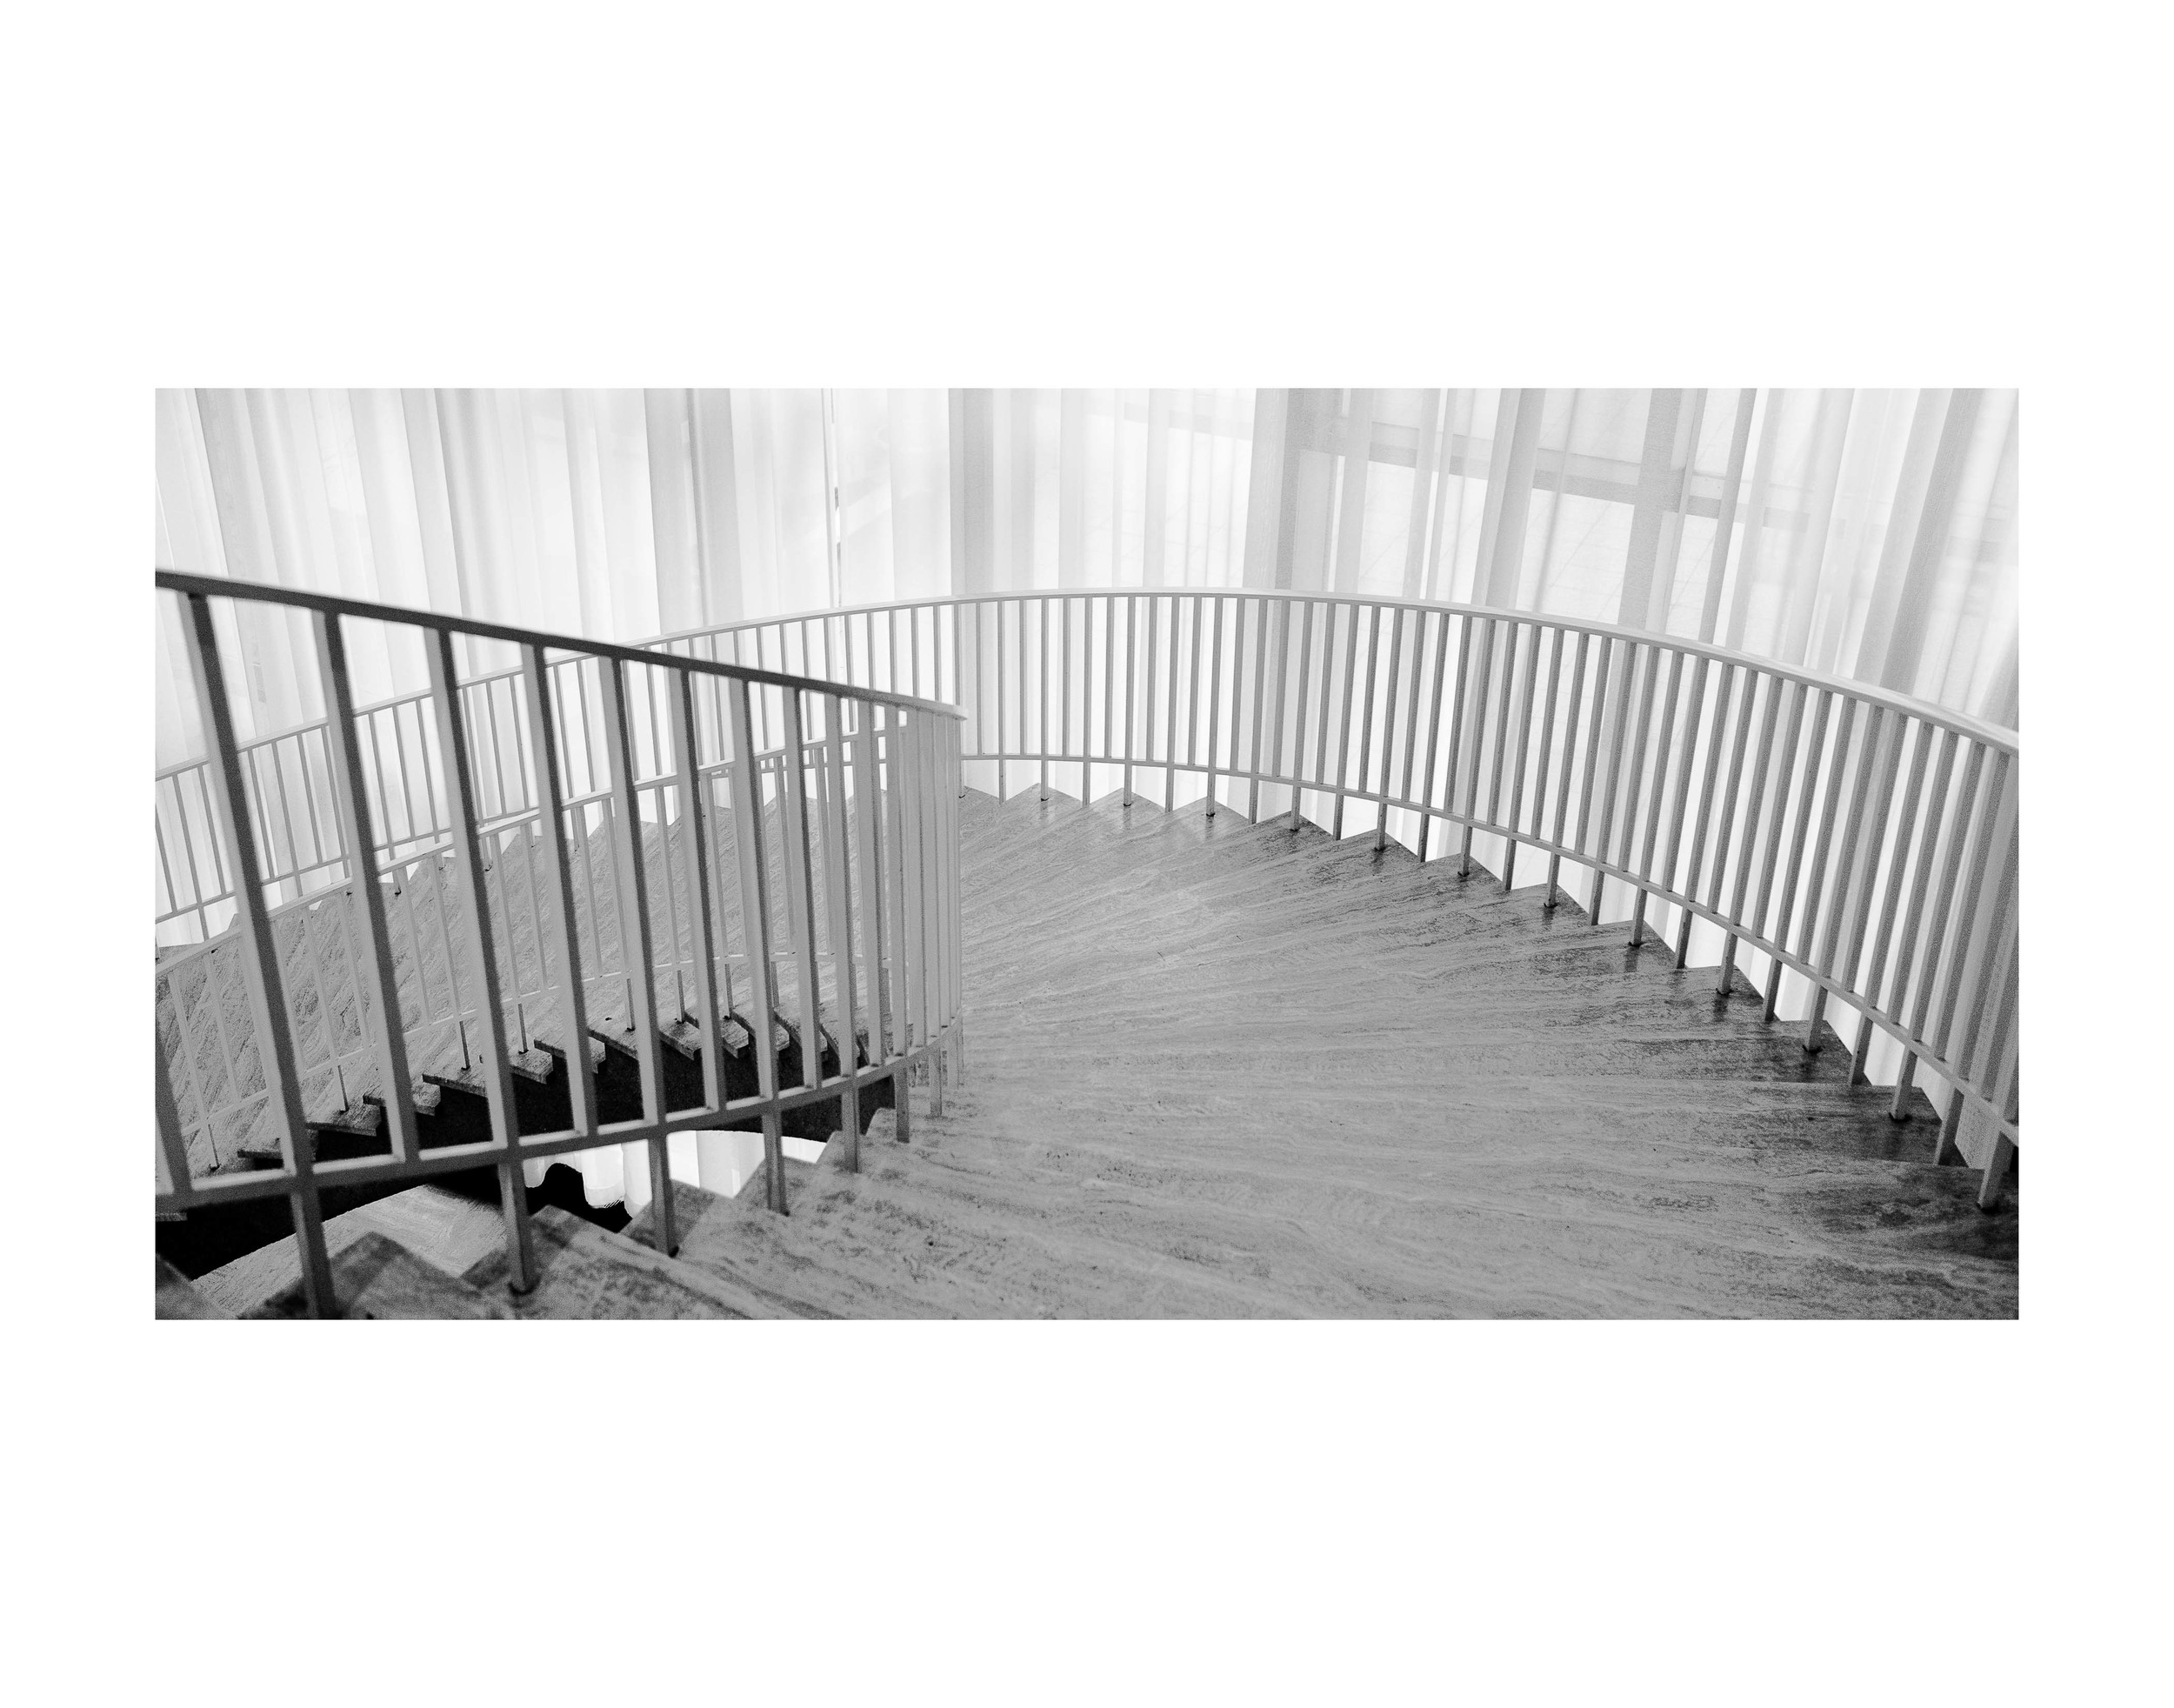 Art Institute Staircase Study. 11x14 framed. $75.